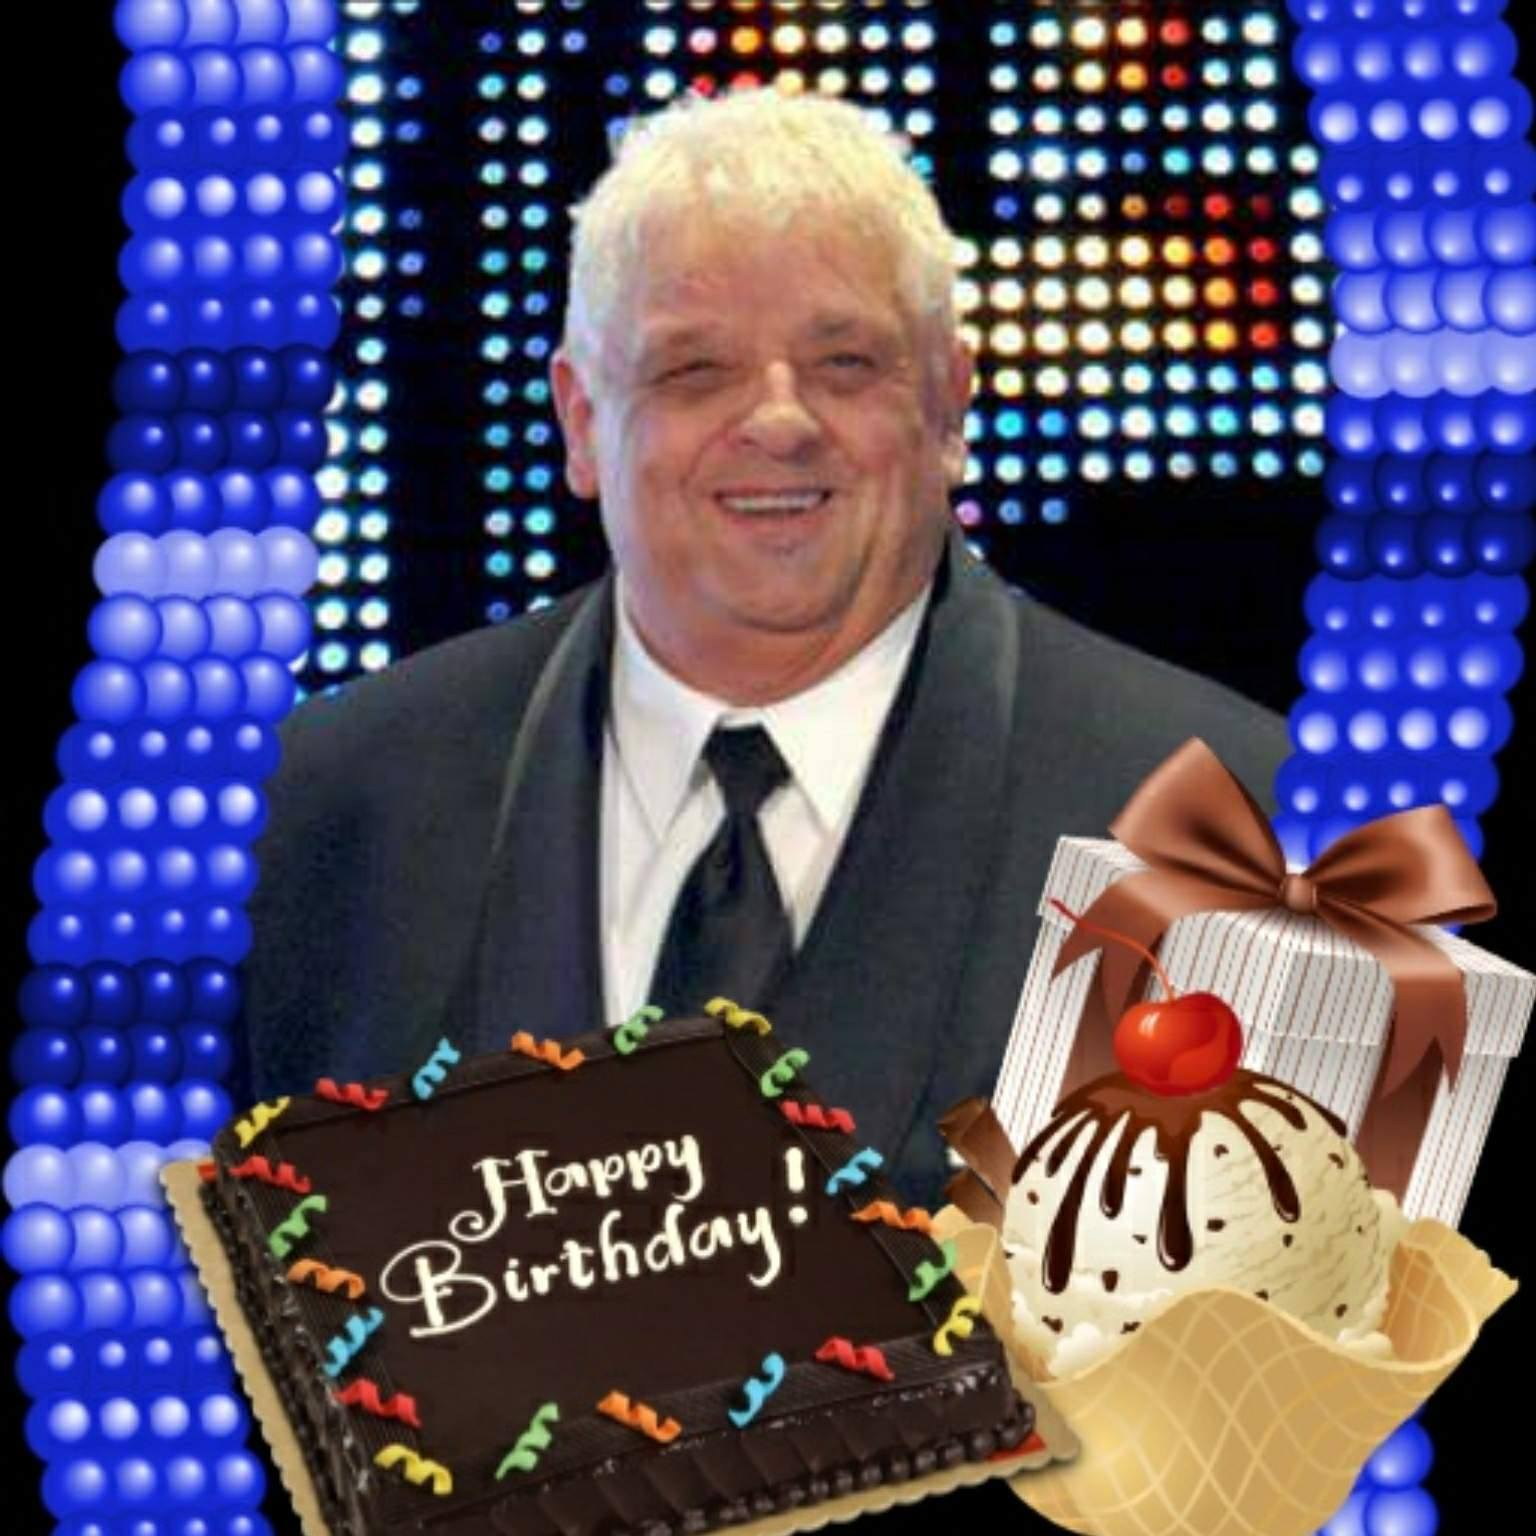 Happy birthday Dusty Rhodes R.I.P